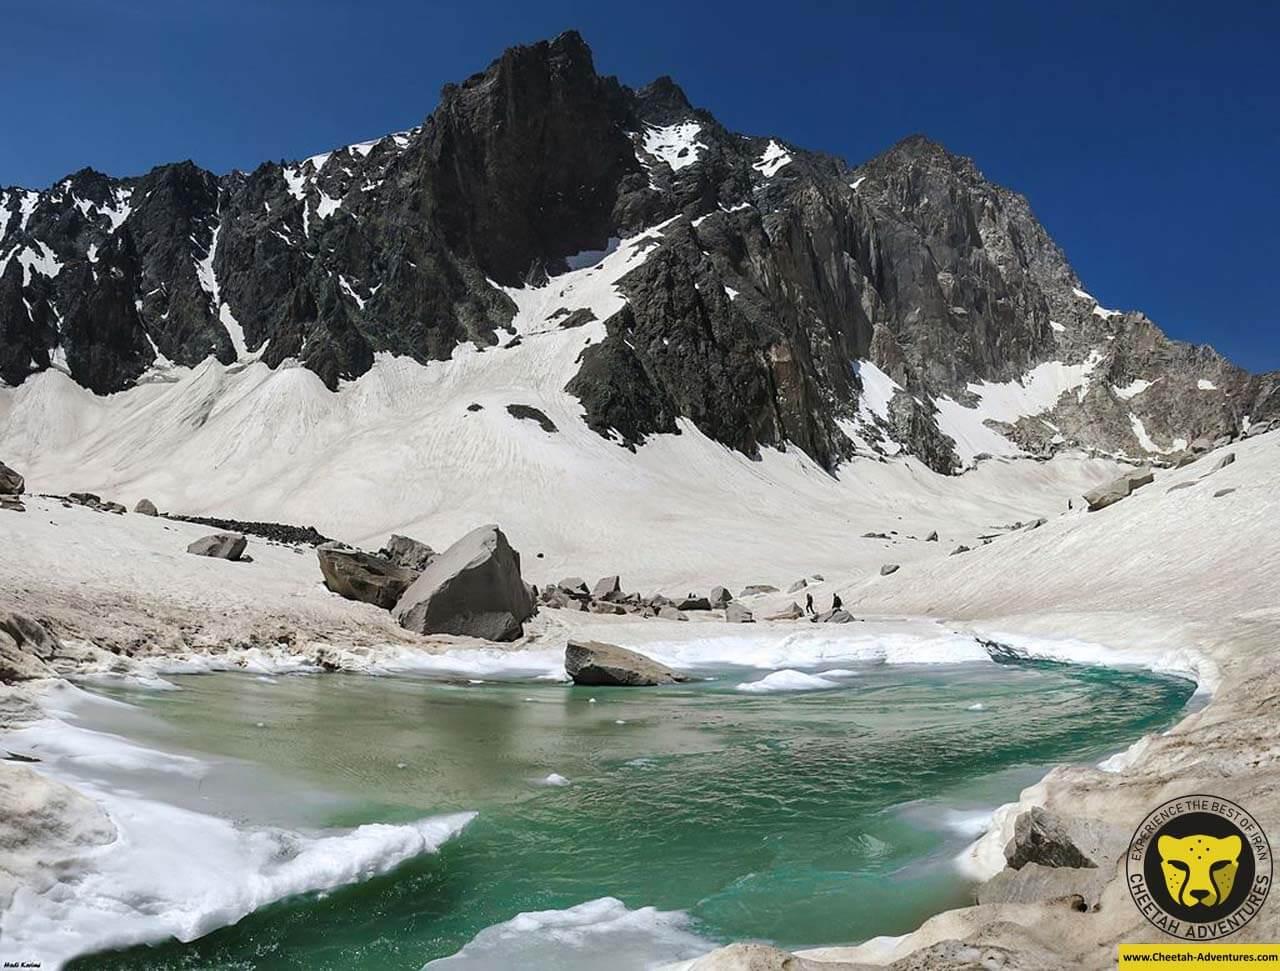 Alamkuh Bigwall, Alamchal Glacier, North face of Alamkuh